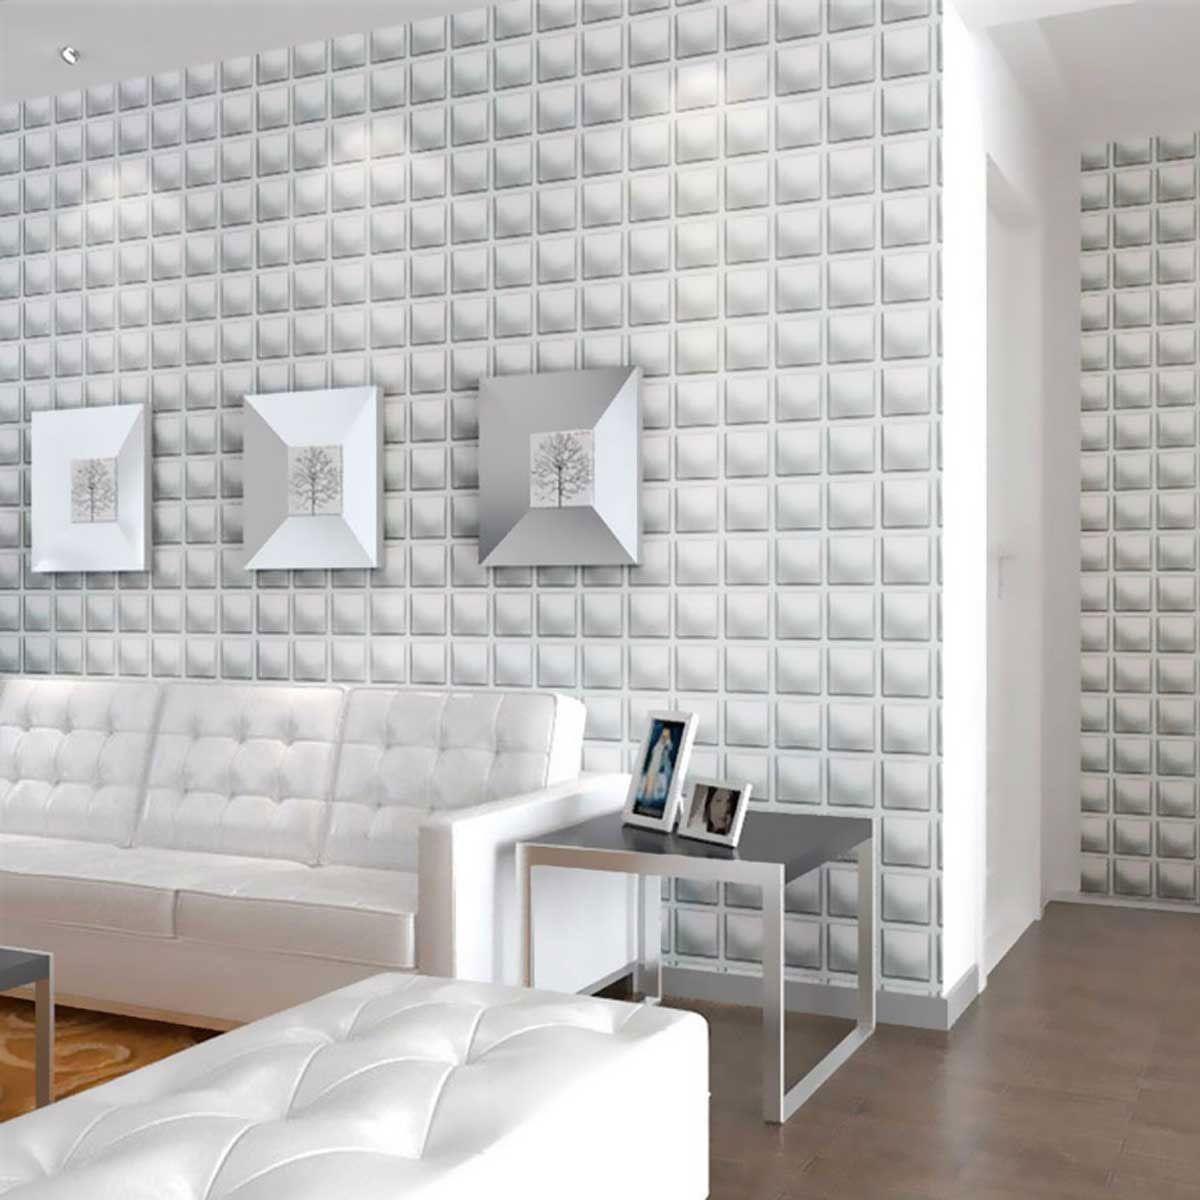 19 5 8 Inch W X 19 5 8 Inch H Classic Endurawall Decorative 3d Wall Panel White 3d Wall Panels Ikea Wall Decor Ikea Wall